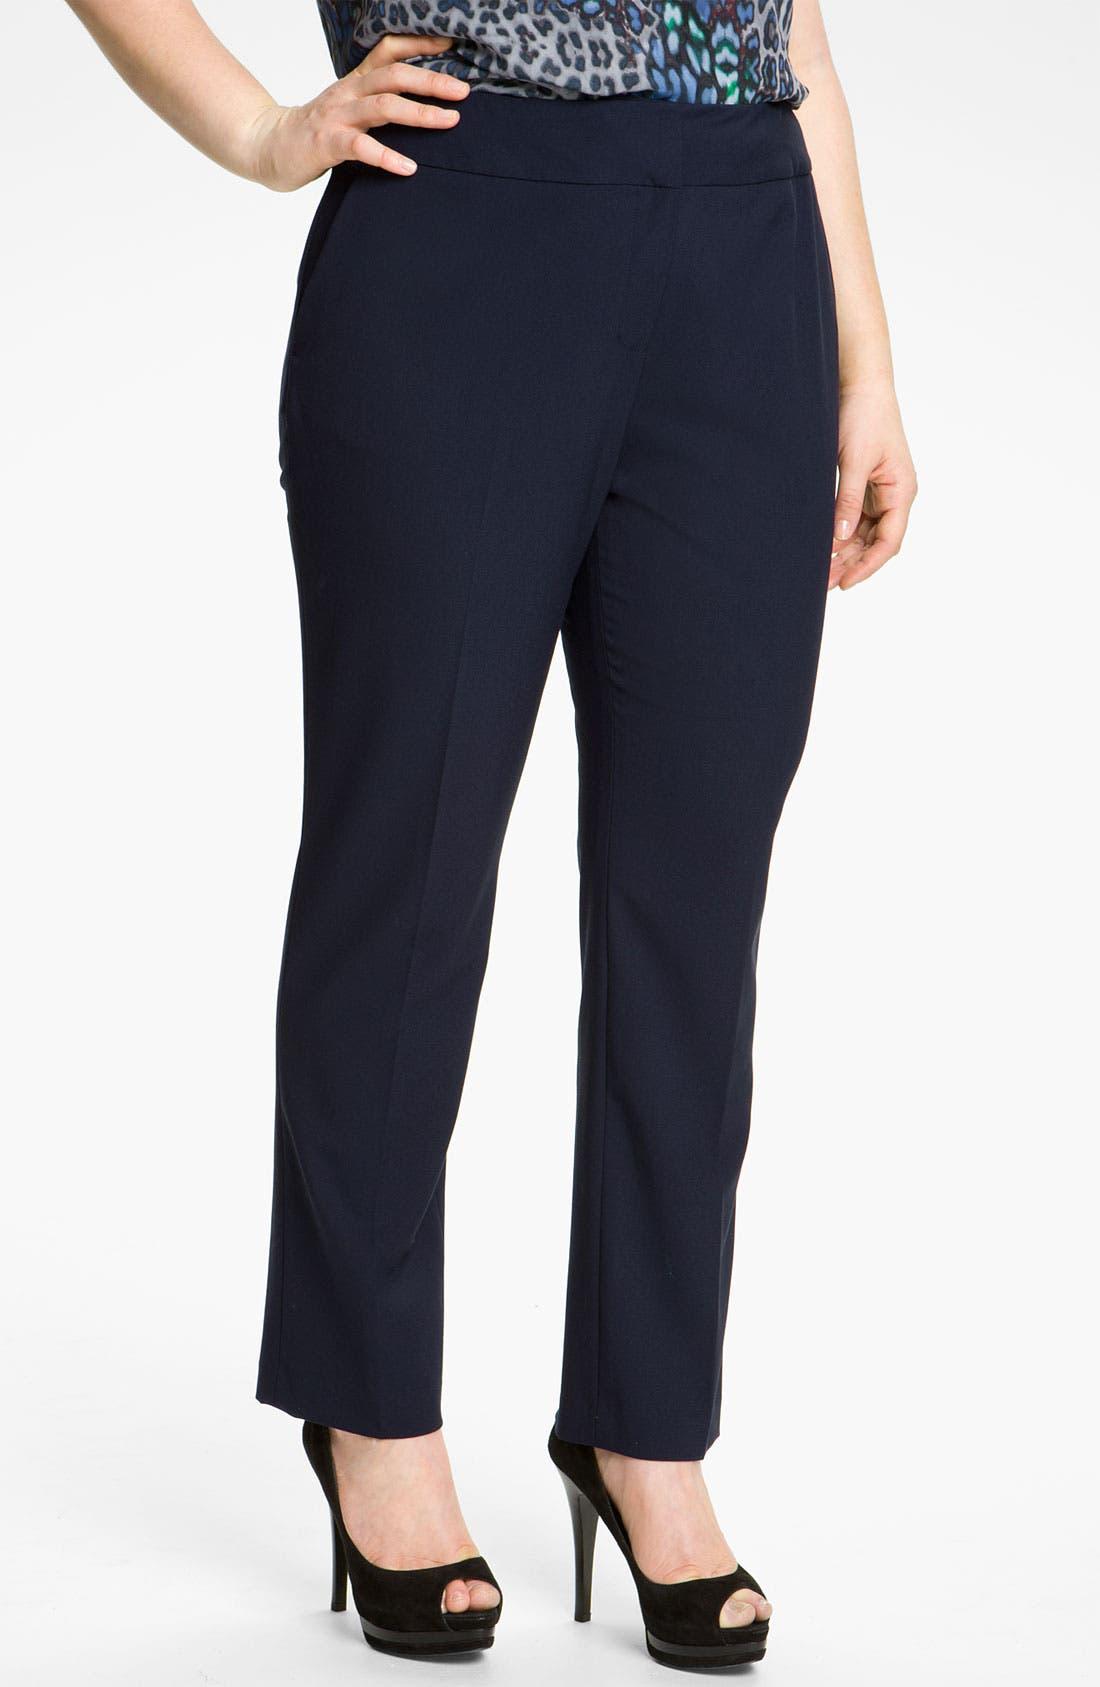 Alternate Image 1 Selected - Vince Camuto Slim Leg Crop Pants (Plus)